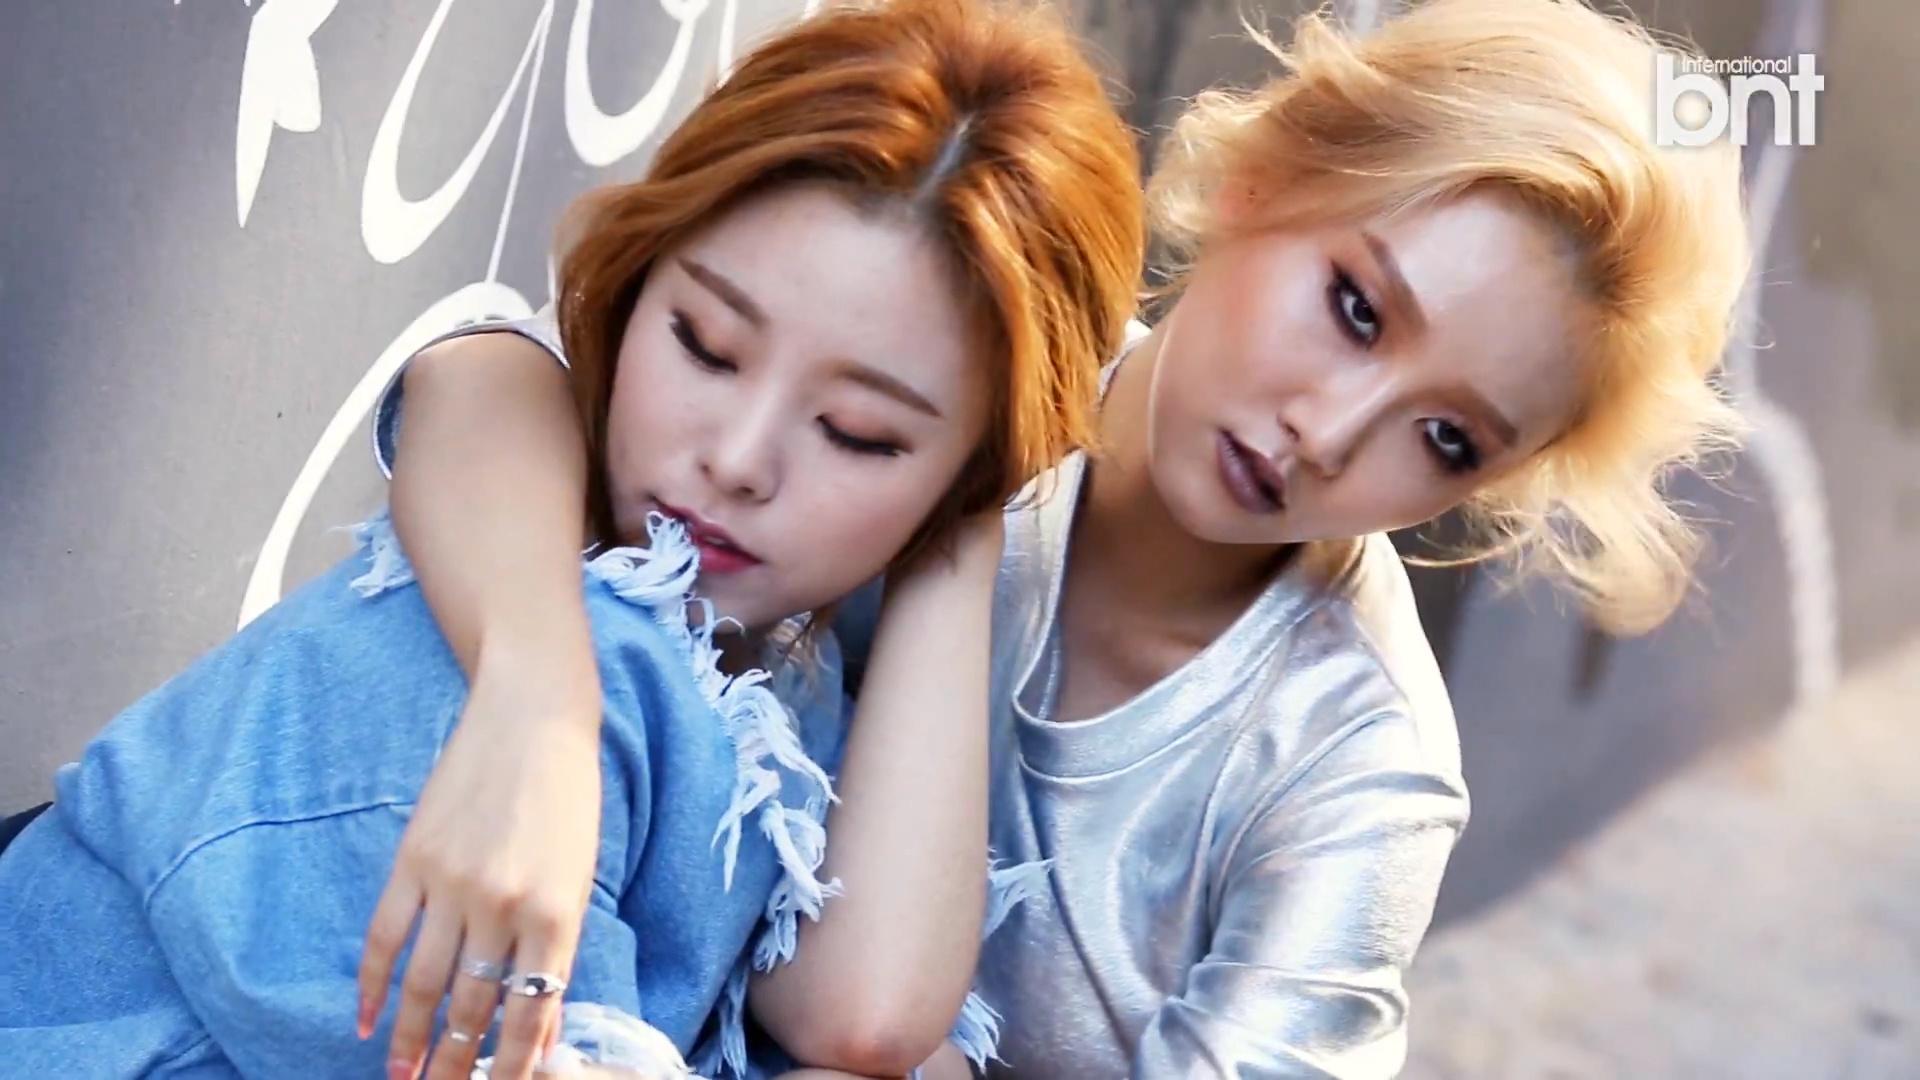 Mamamoo Hd Wallpaper Asiachan Kpop Jpop Image Board